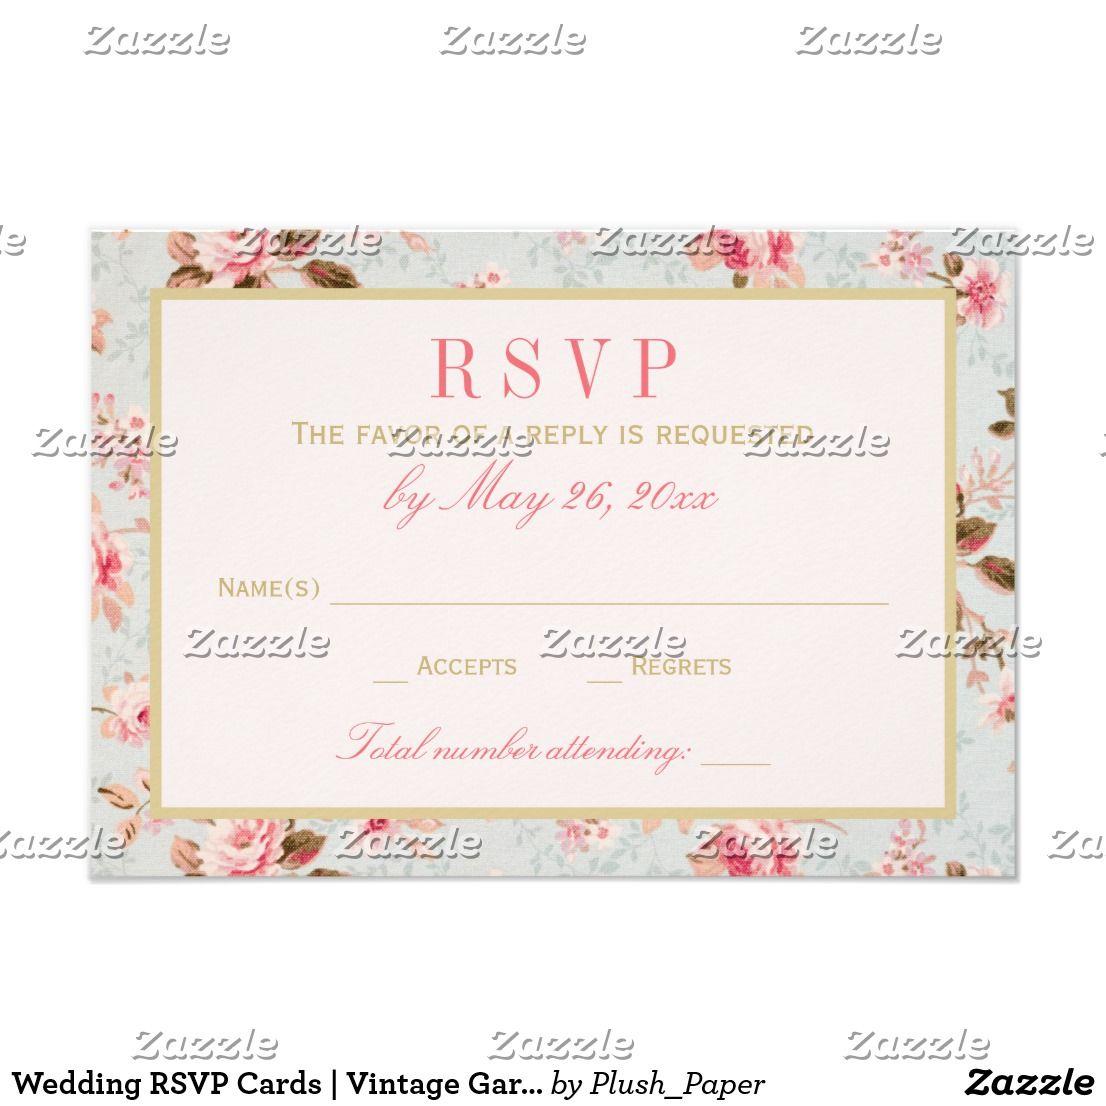 Wedding RSVP Cards | Vintage Garden Party | Vintage garden parties ...